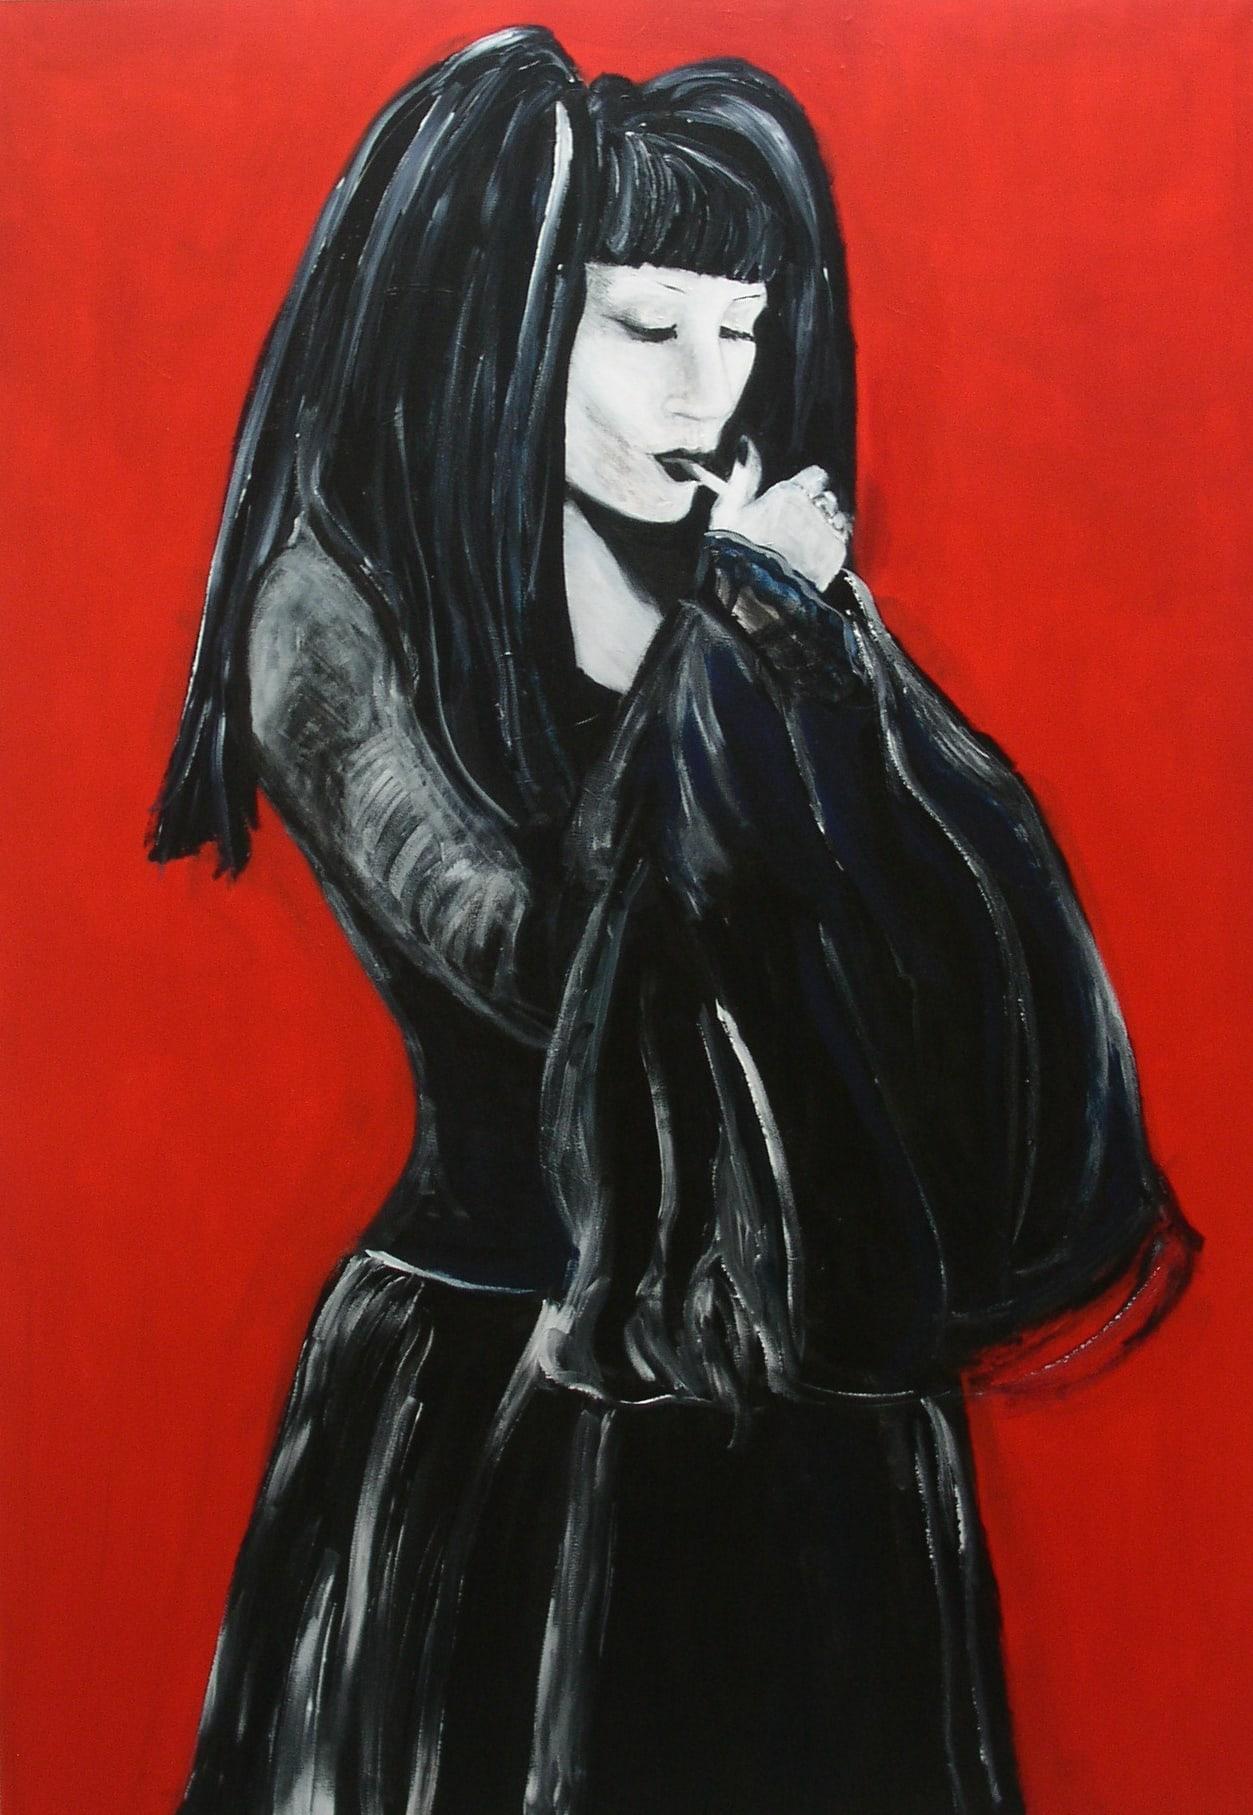 'Kiki cig', acryl op doek/acrylic on canvas, 100x140 cm.